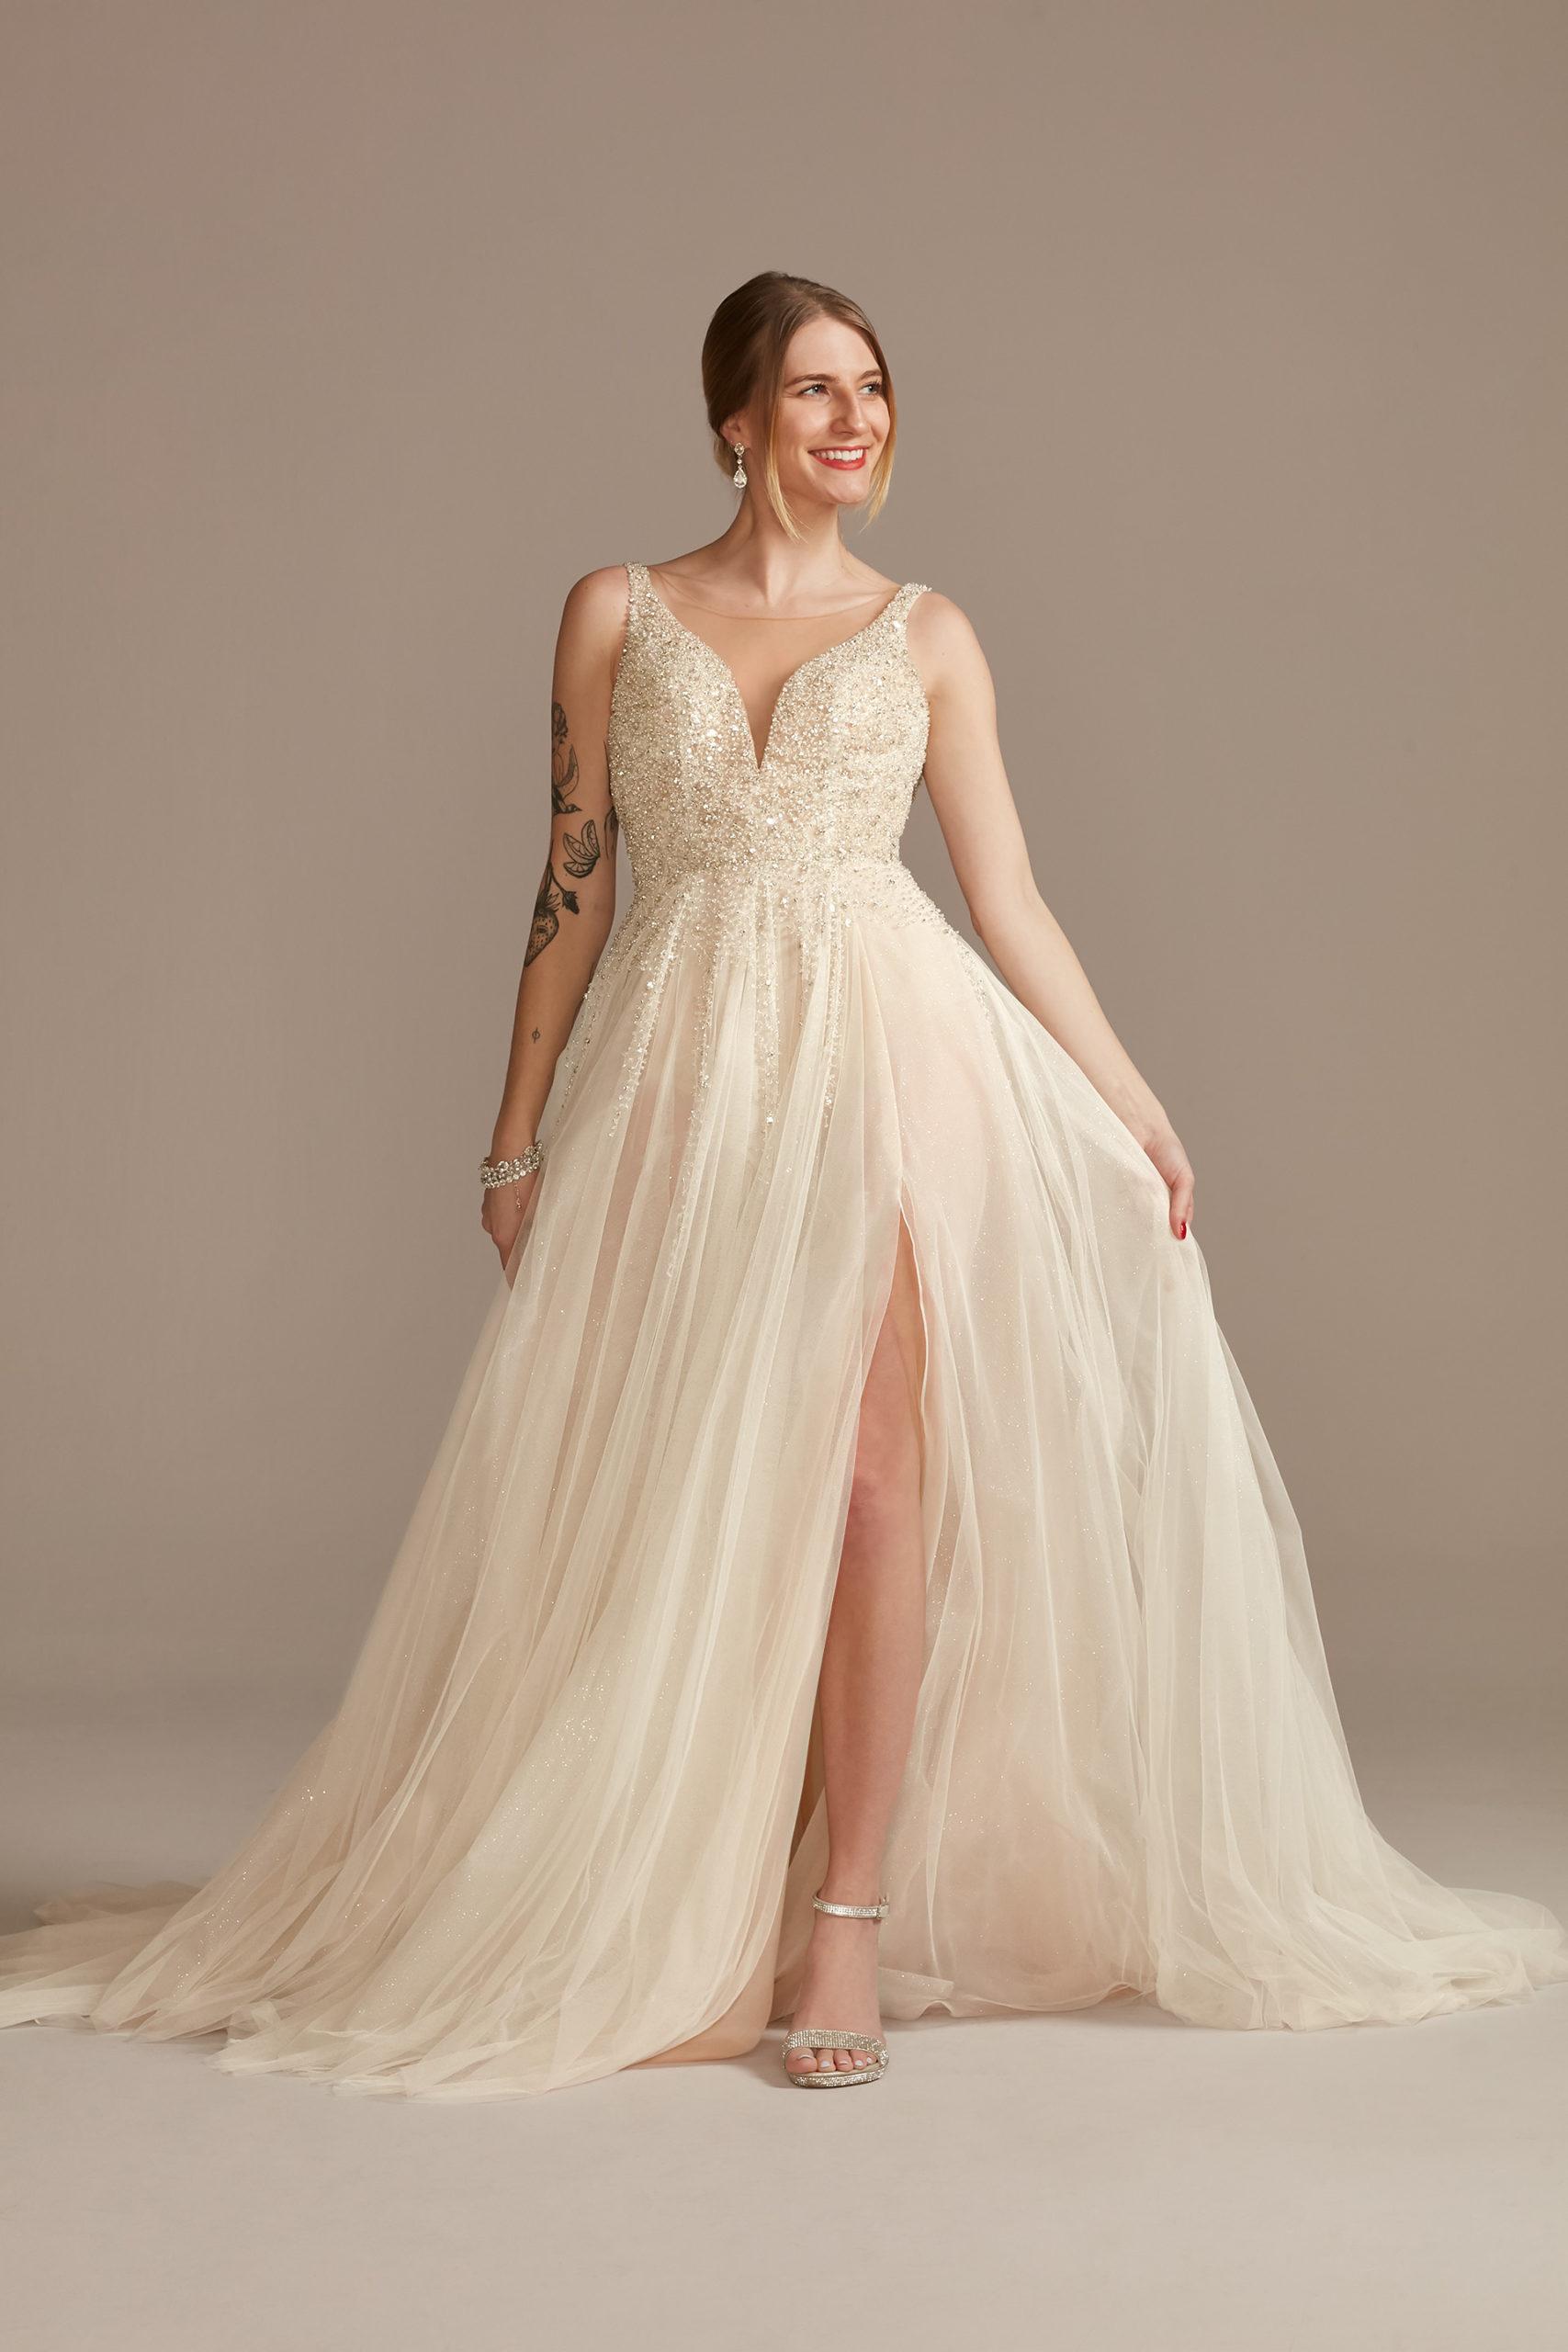 bride wearing Beaded Plunge Illusion Bodysuit Wedding Dress